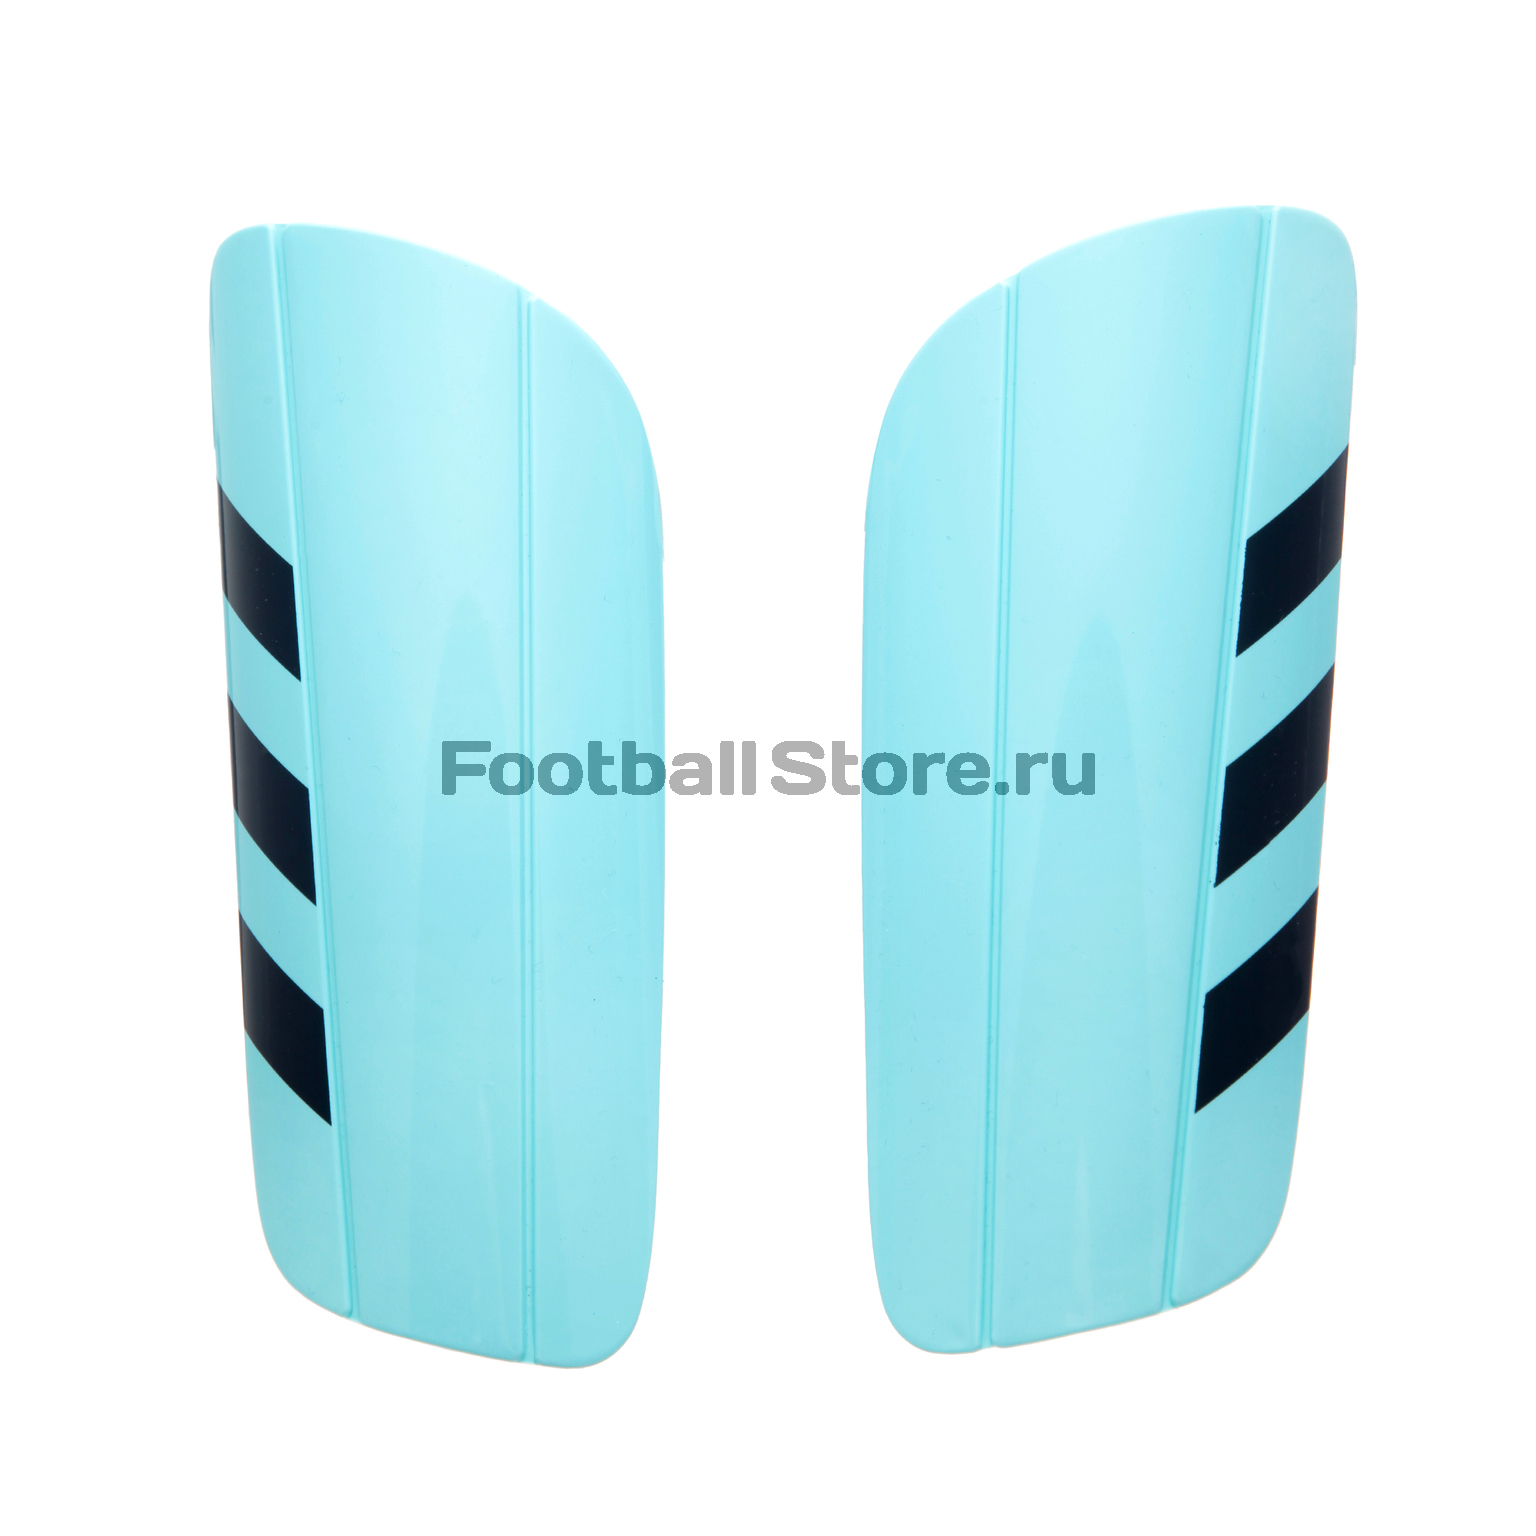 все цены на Защита ног Adidas Щитки Adidas Ghost Lesto BR5366 онлайн